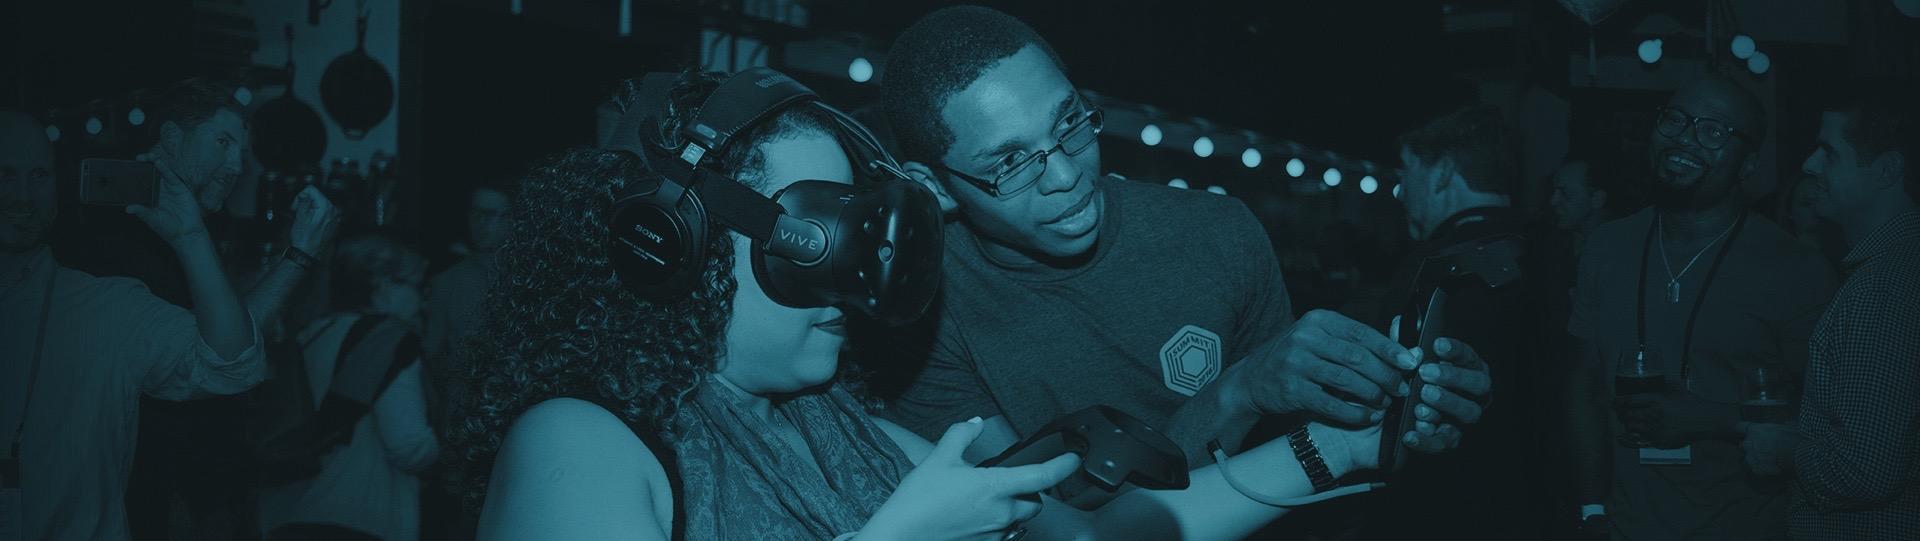 Virtual Reality Rental Co. users